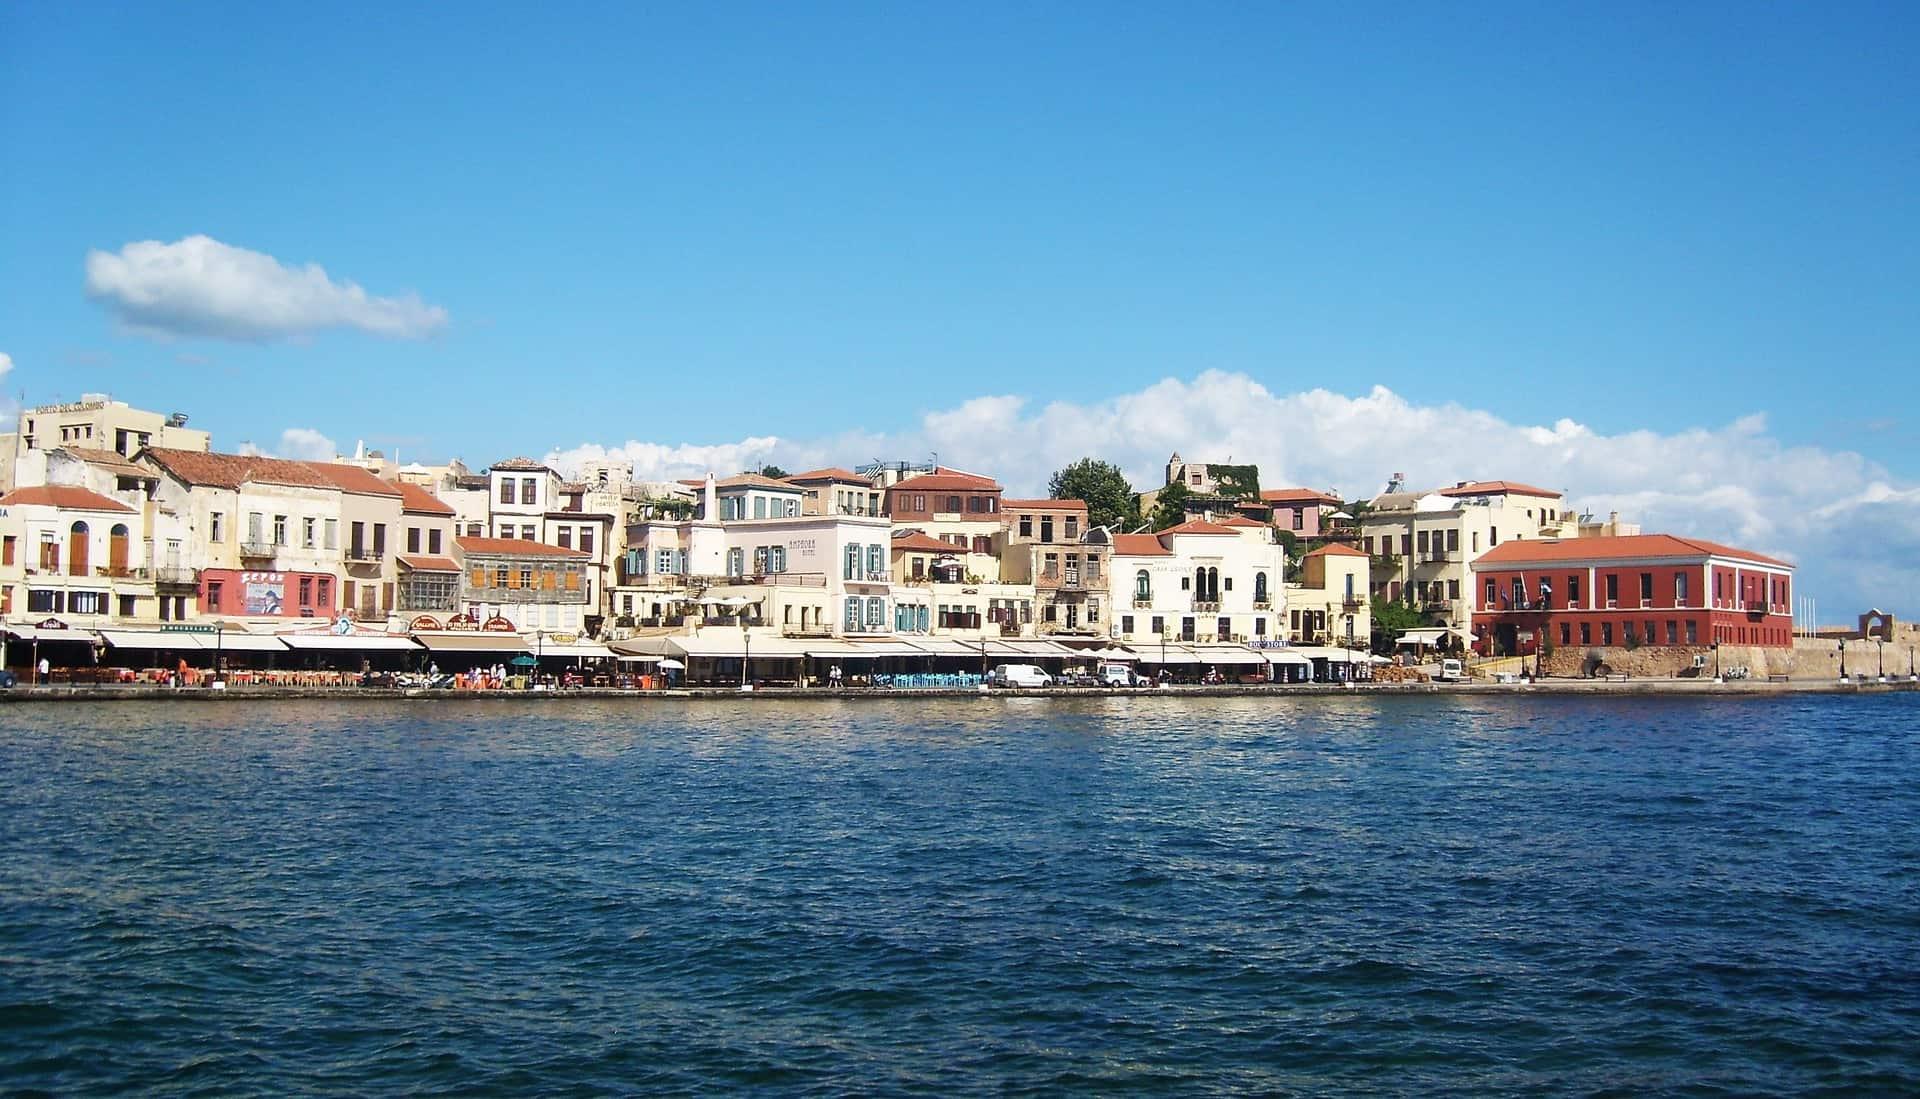 Heraklion City Waterfront